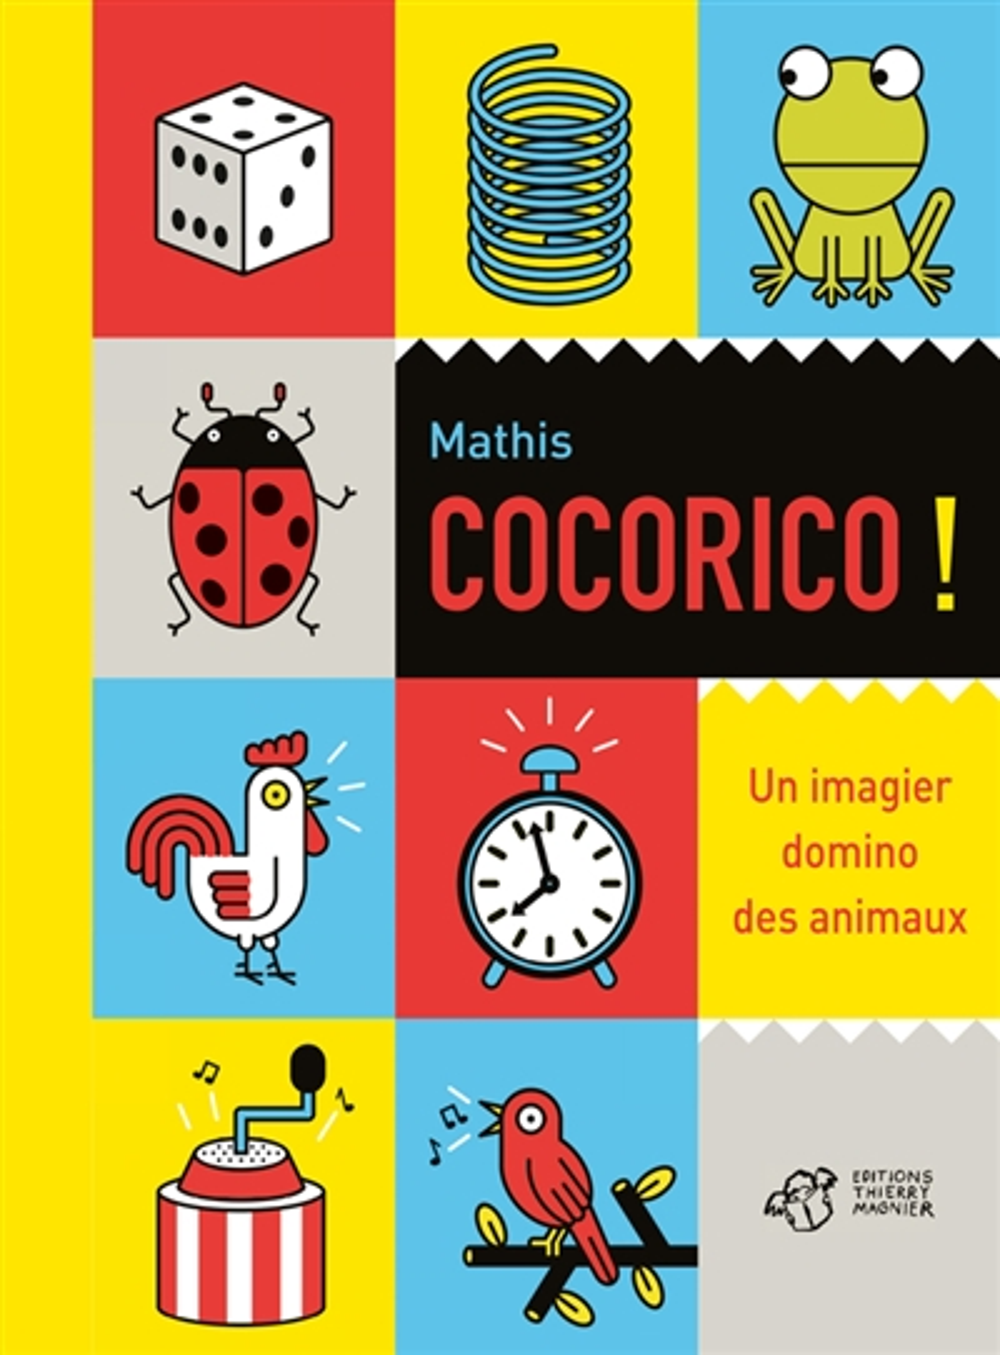 COCORICO ! UN IMAGIER DOMINO DES ANIMAUX MATHIS THIERRY MAGNIER